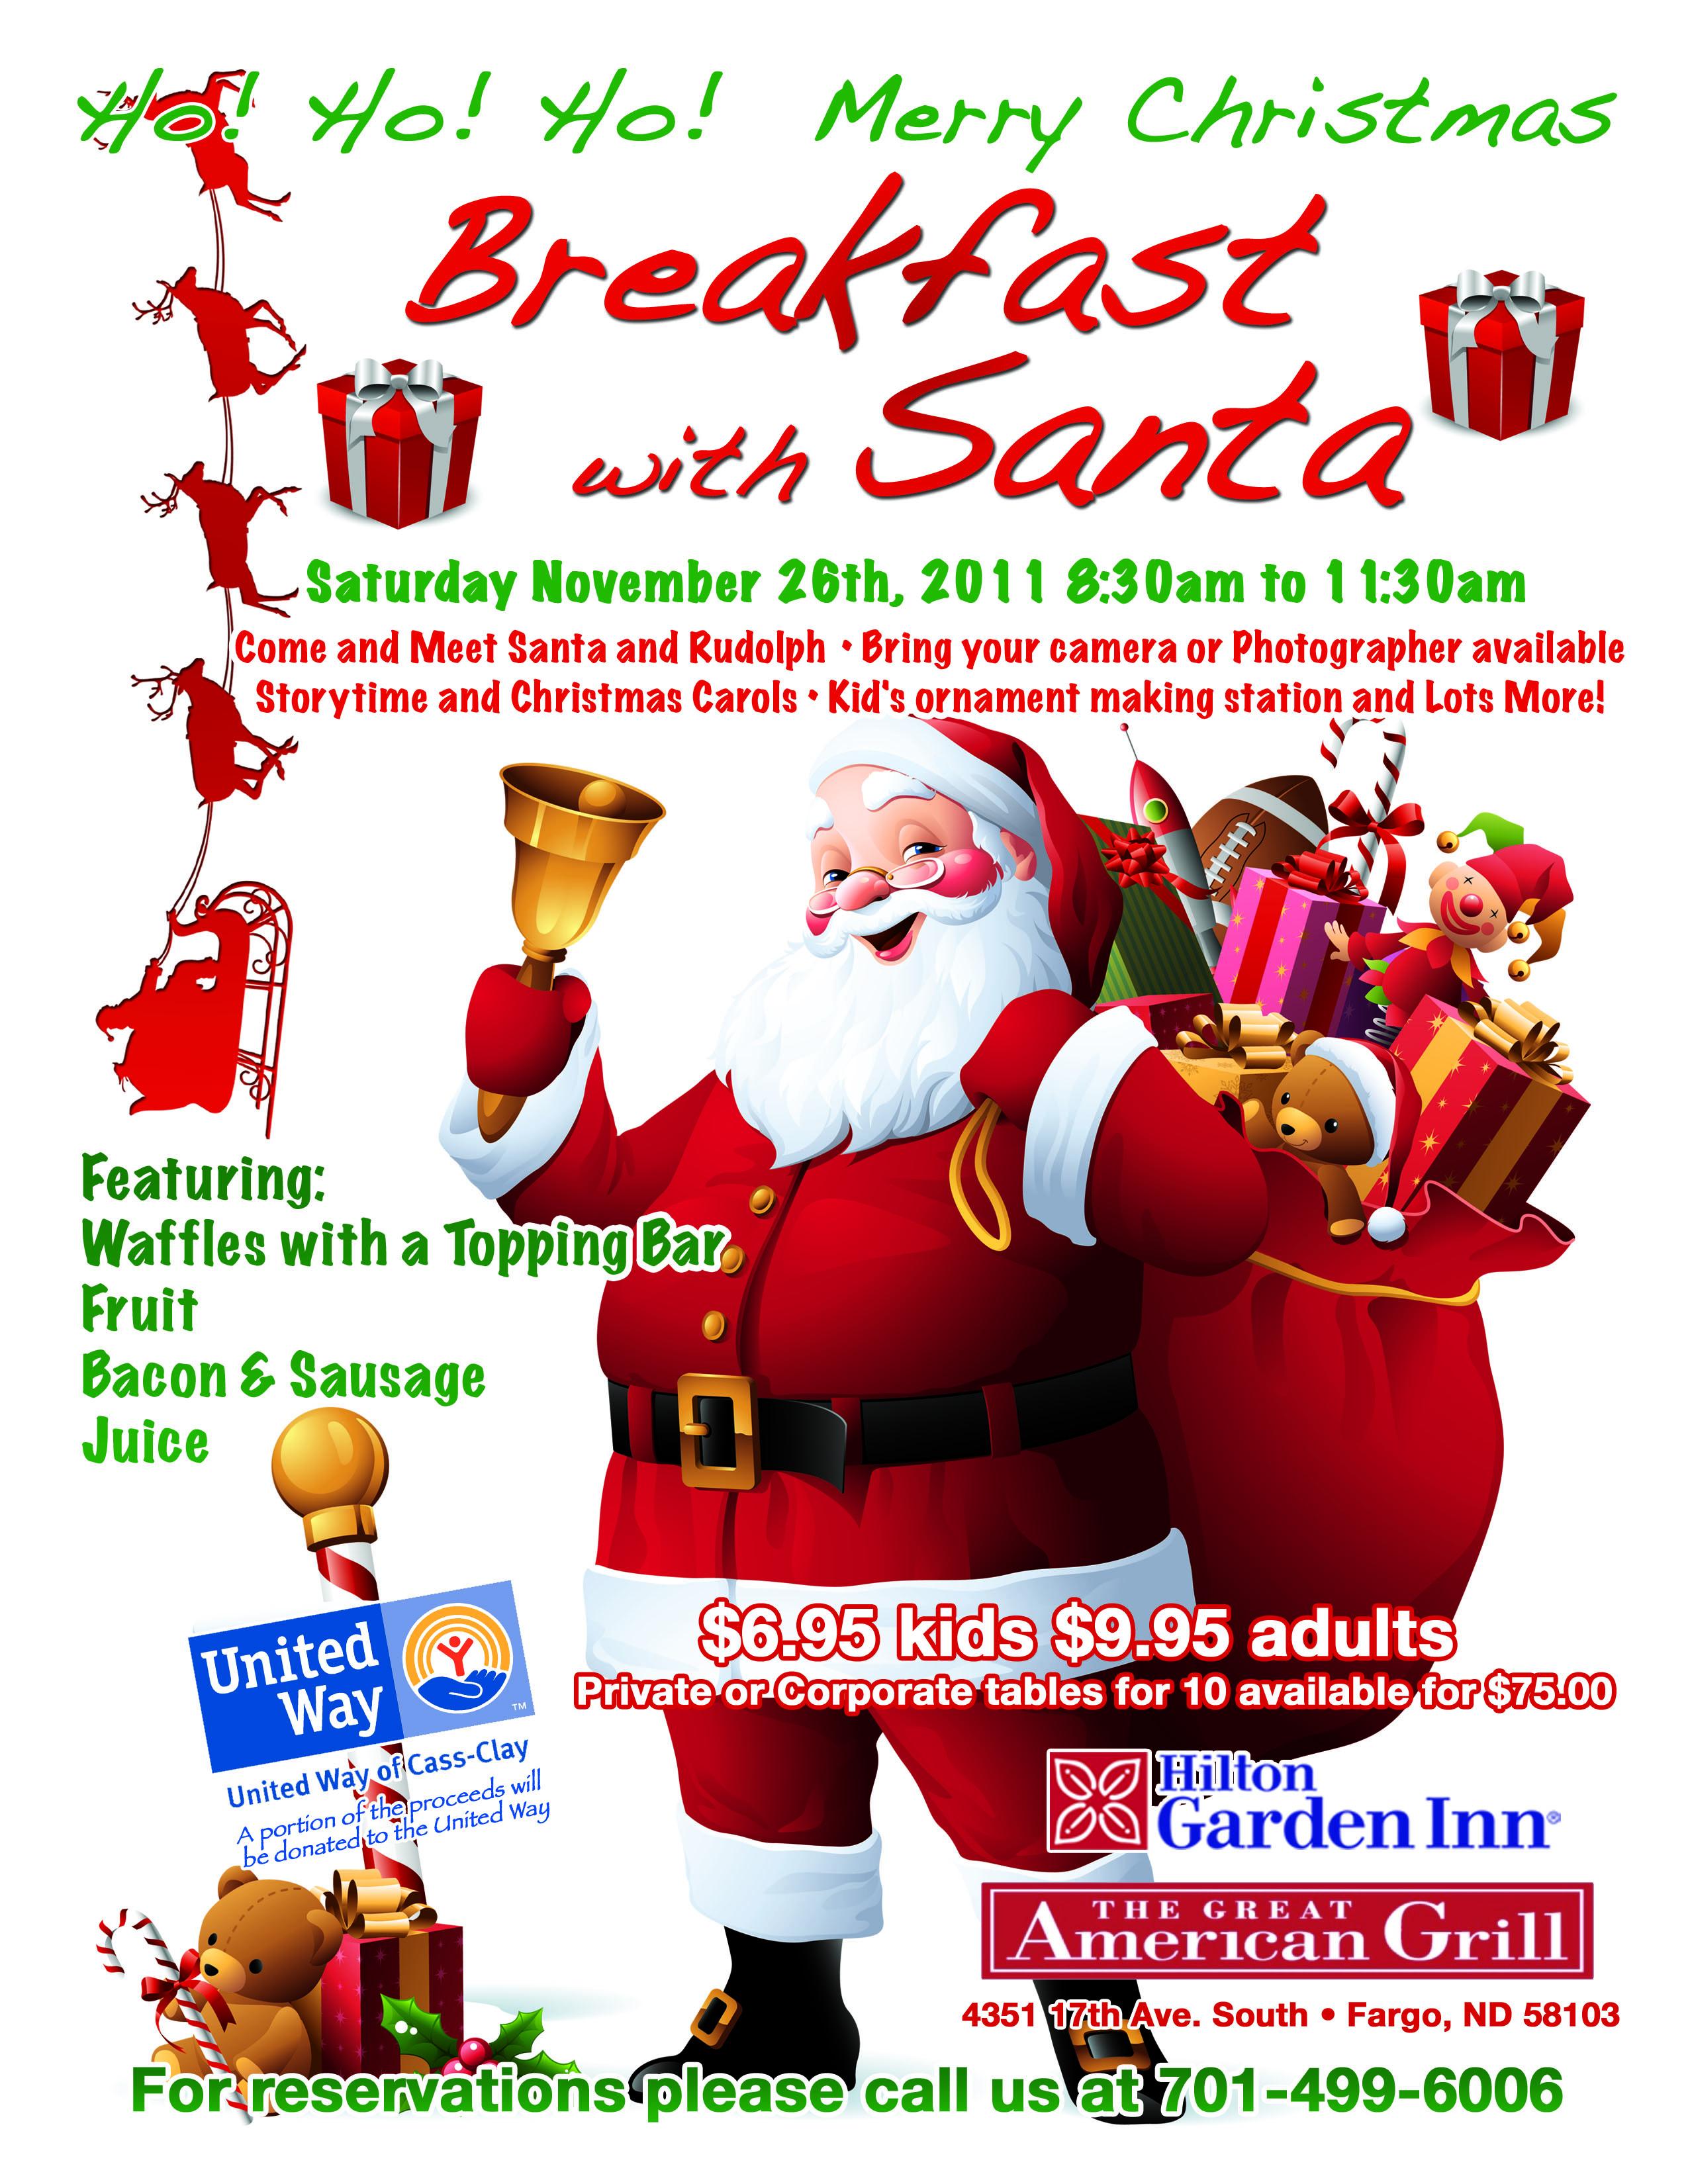 HGI Fargo - Santa Breakfast